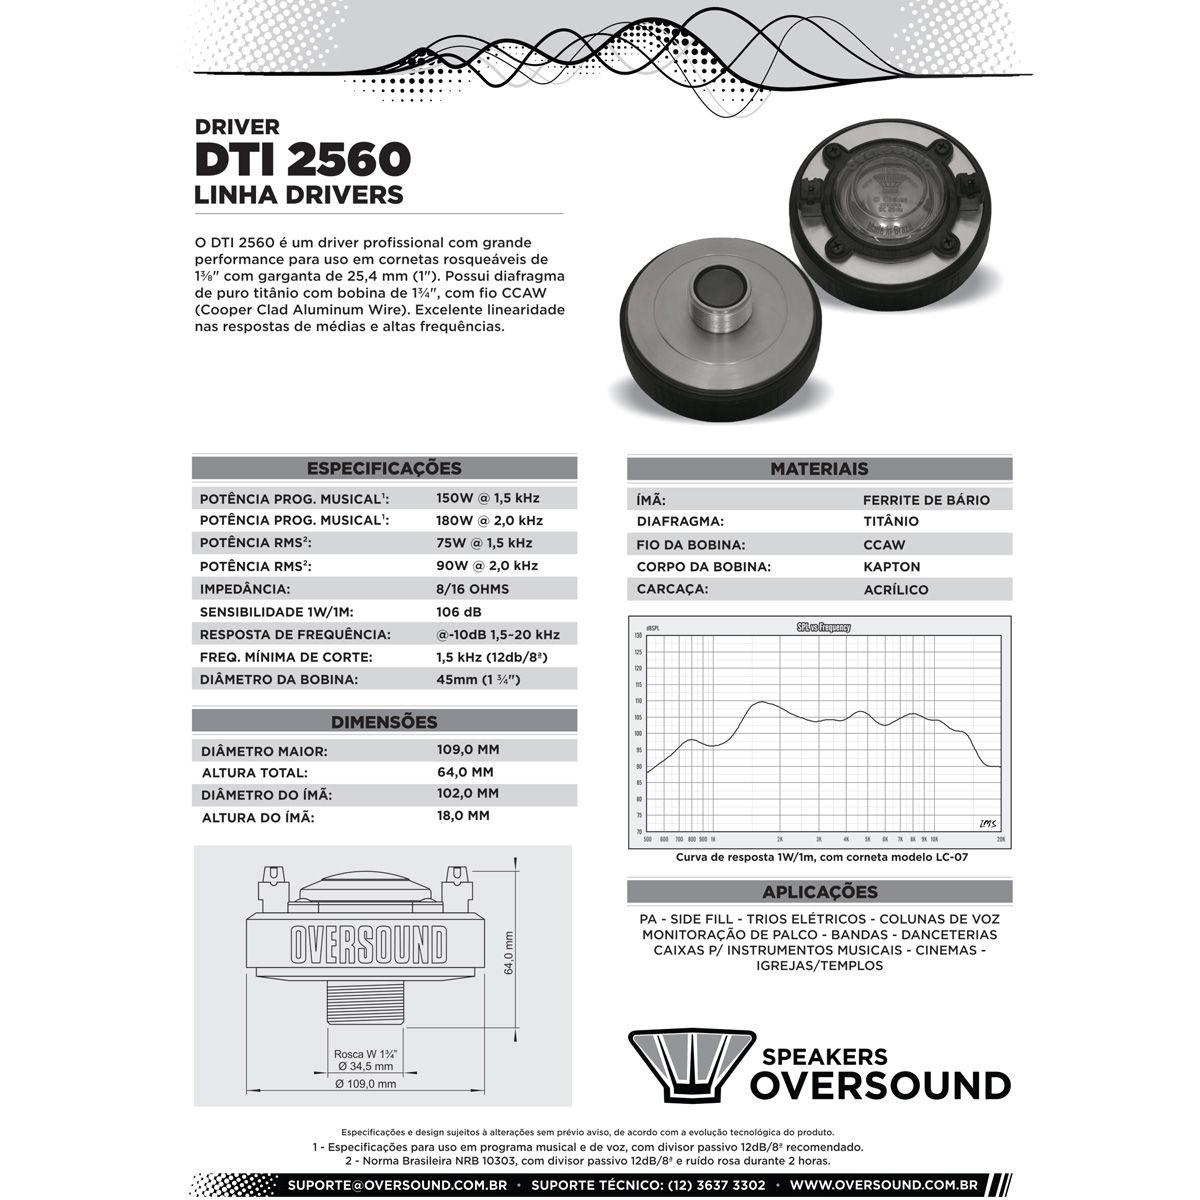 Driver DTI 2560 + Corneta - Oversound  - RS Som e Luz!